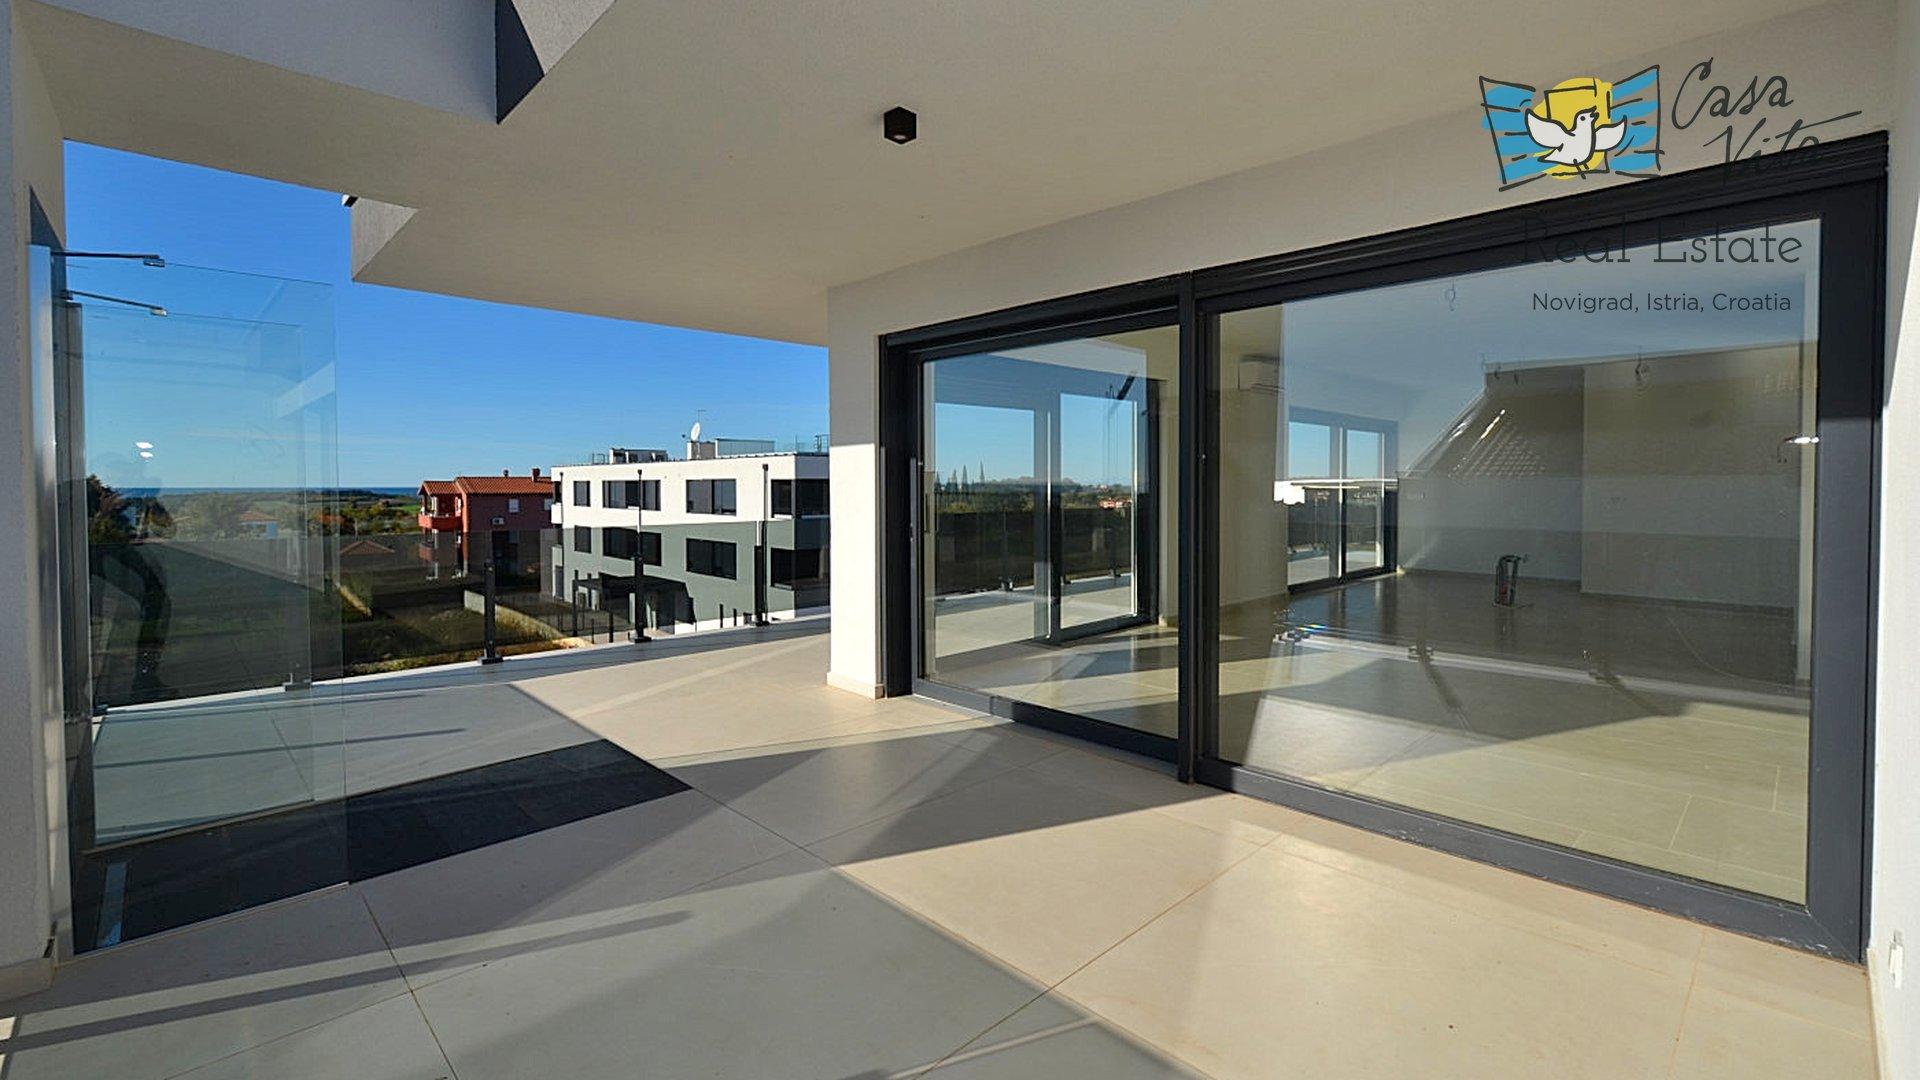 Appartamento, 162 m2, Vendita, Novigrad